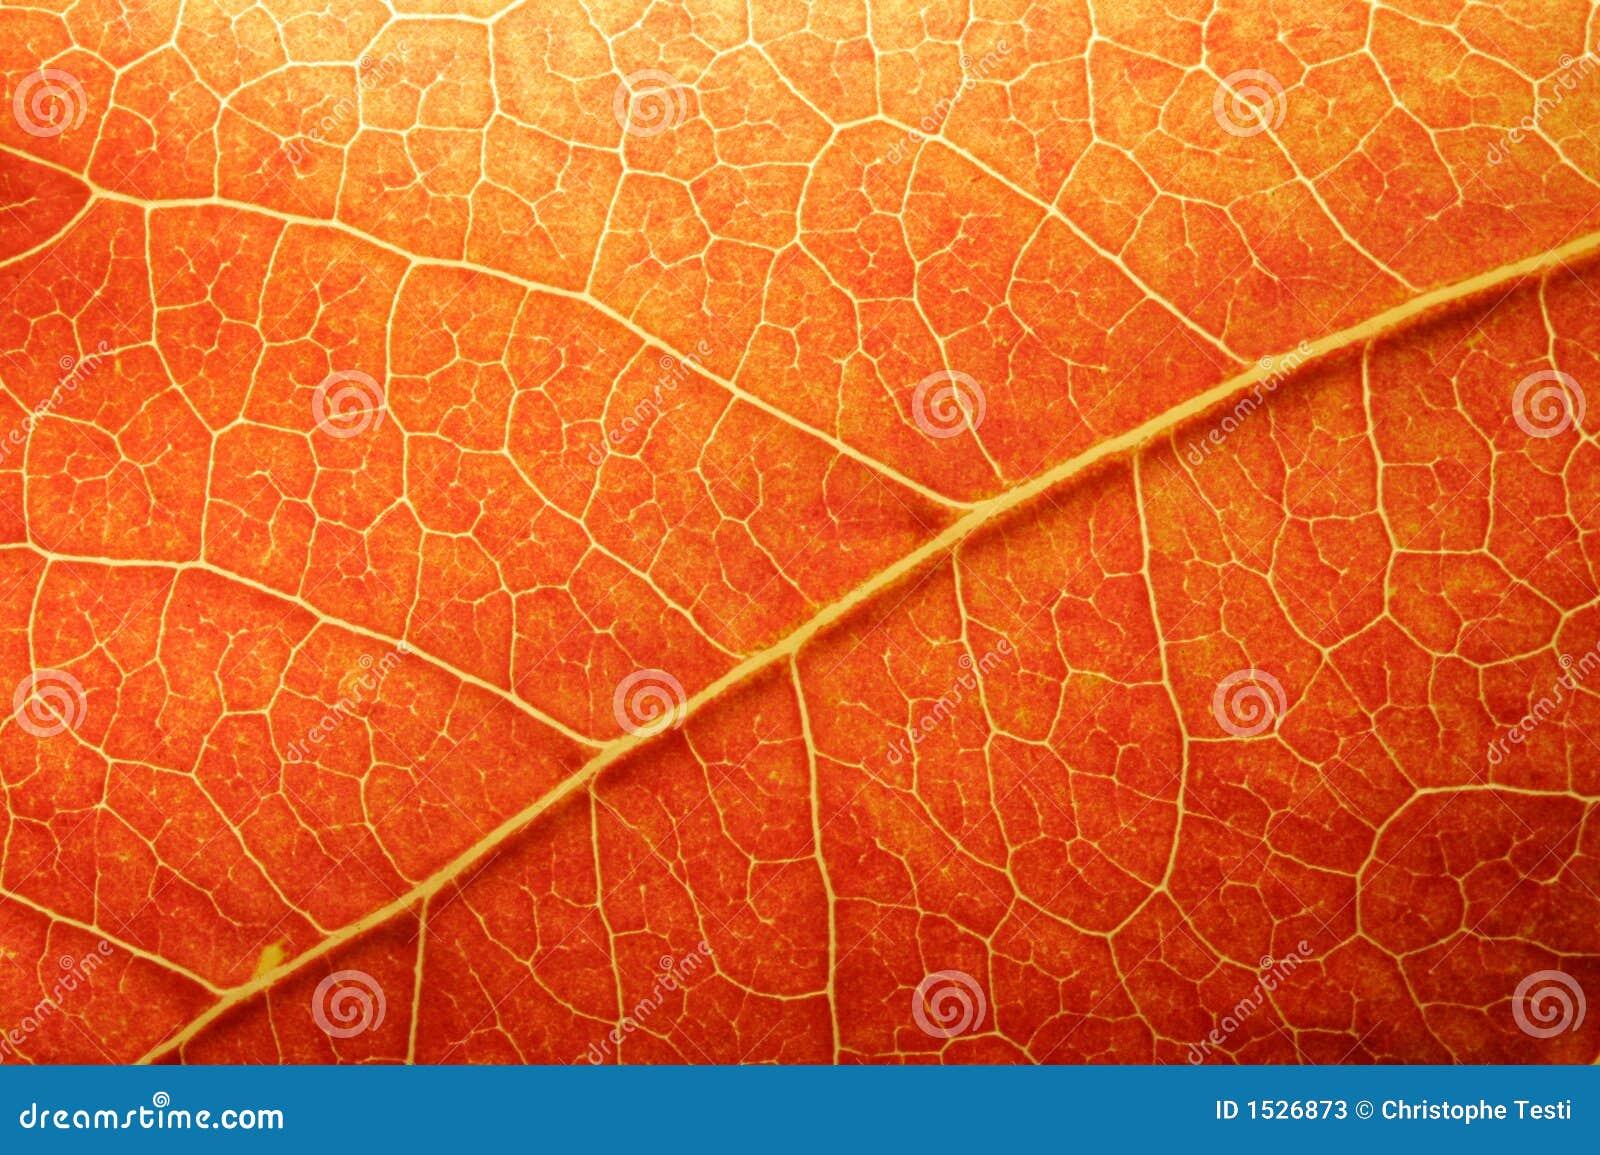 Orange leaf closeup stock photos image 1526873 for Amber leaf